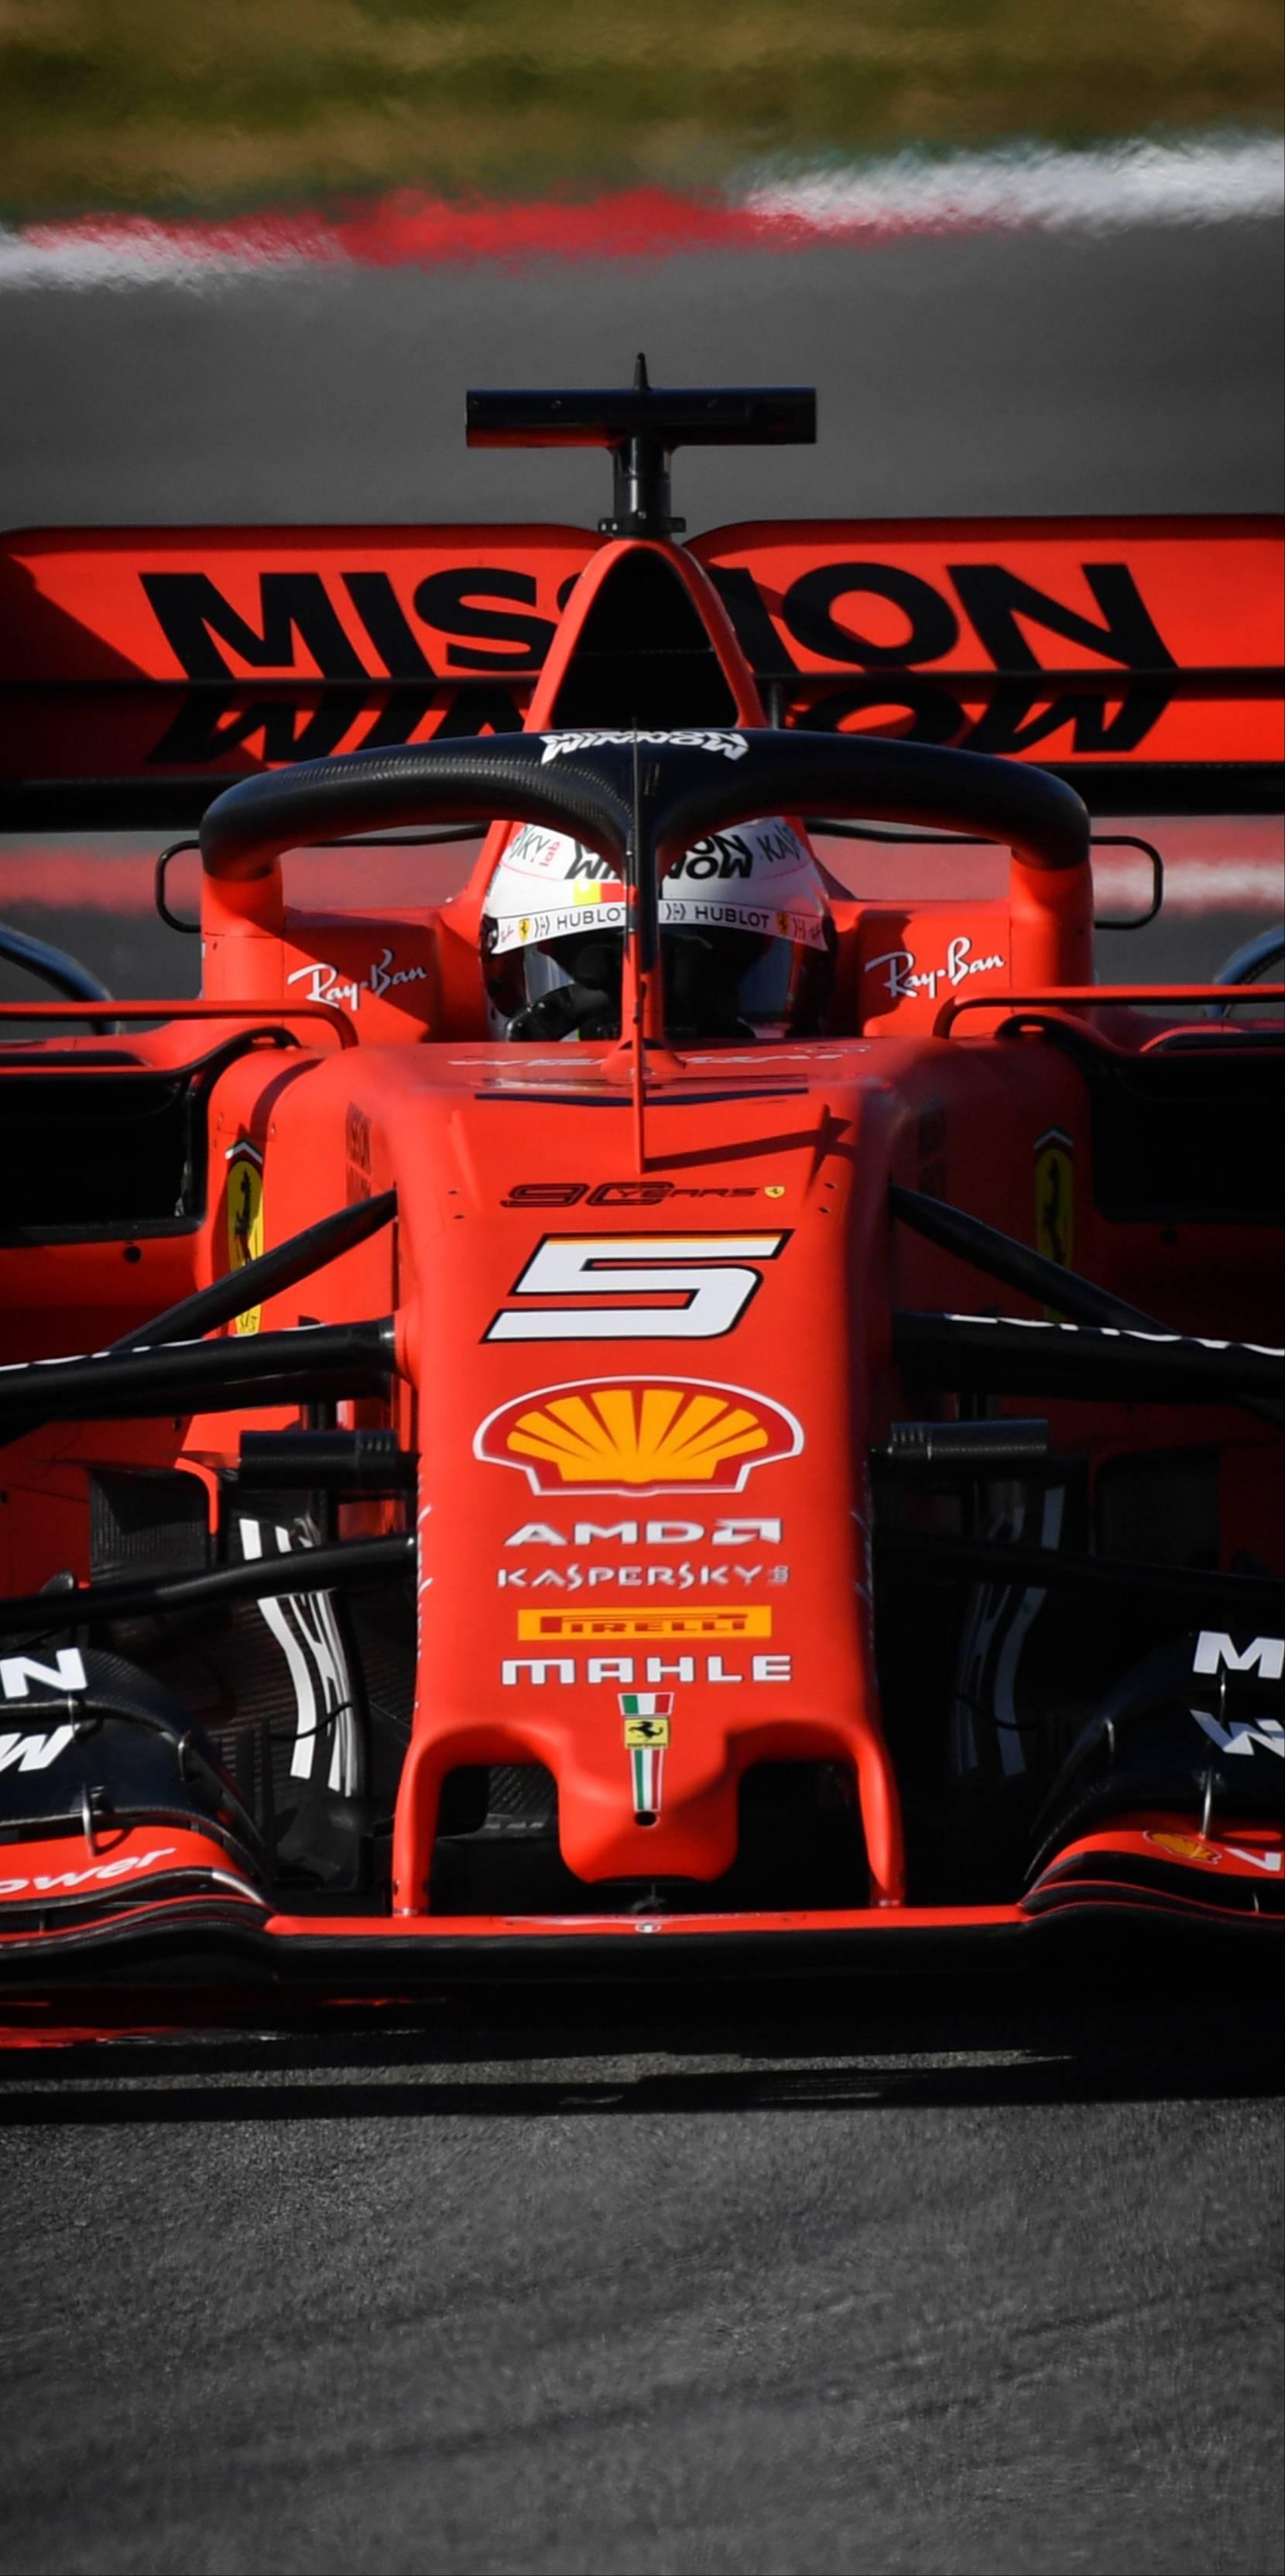 Ferrari F1 Iphone Wallpapers Top Free Ferrari F1 Iphone Backgrounds Wallpaperaccess